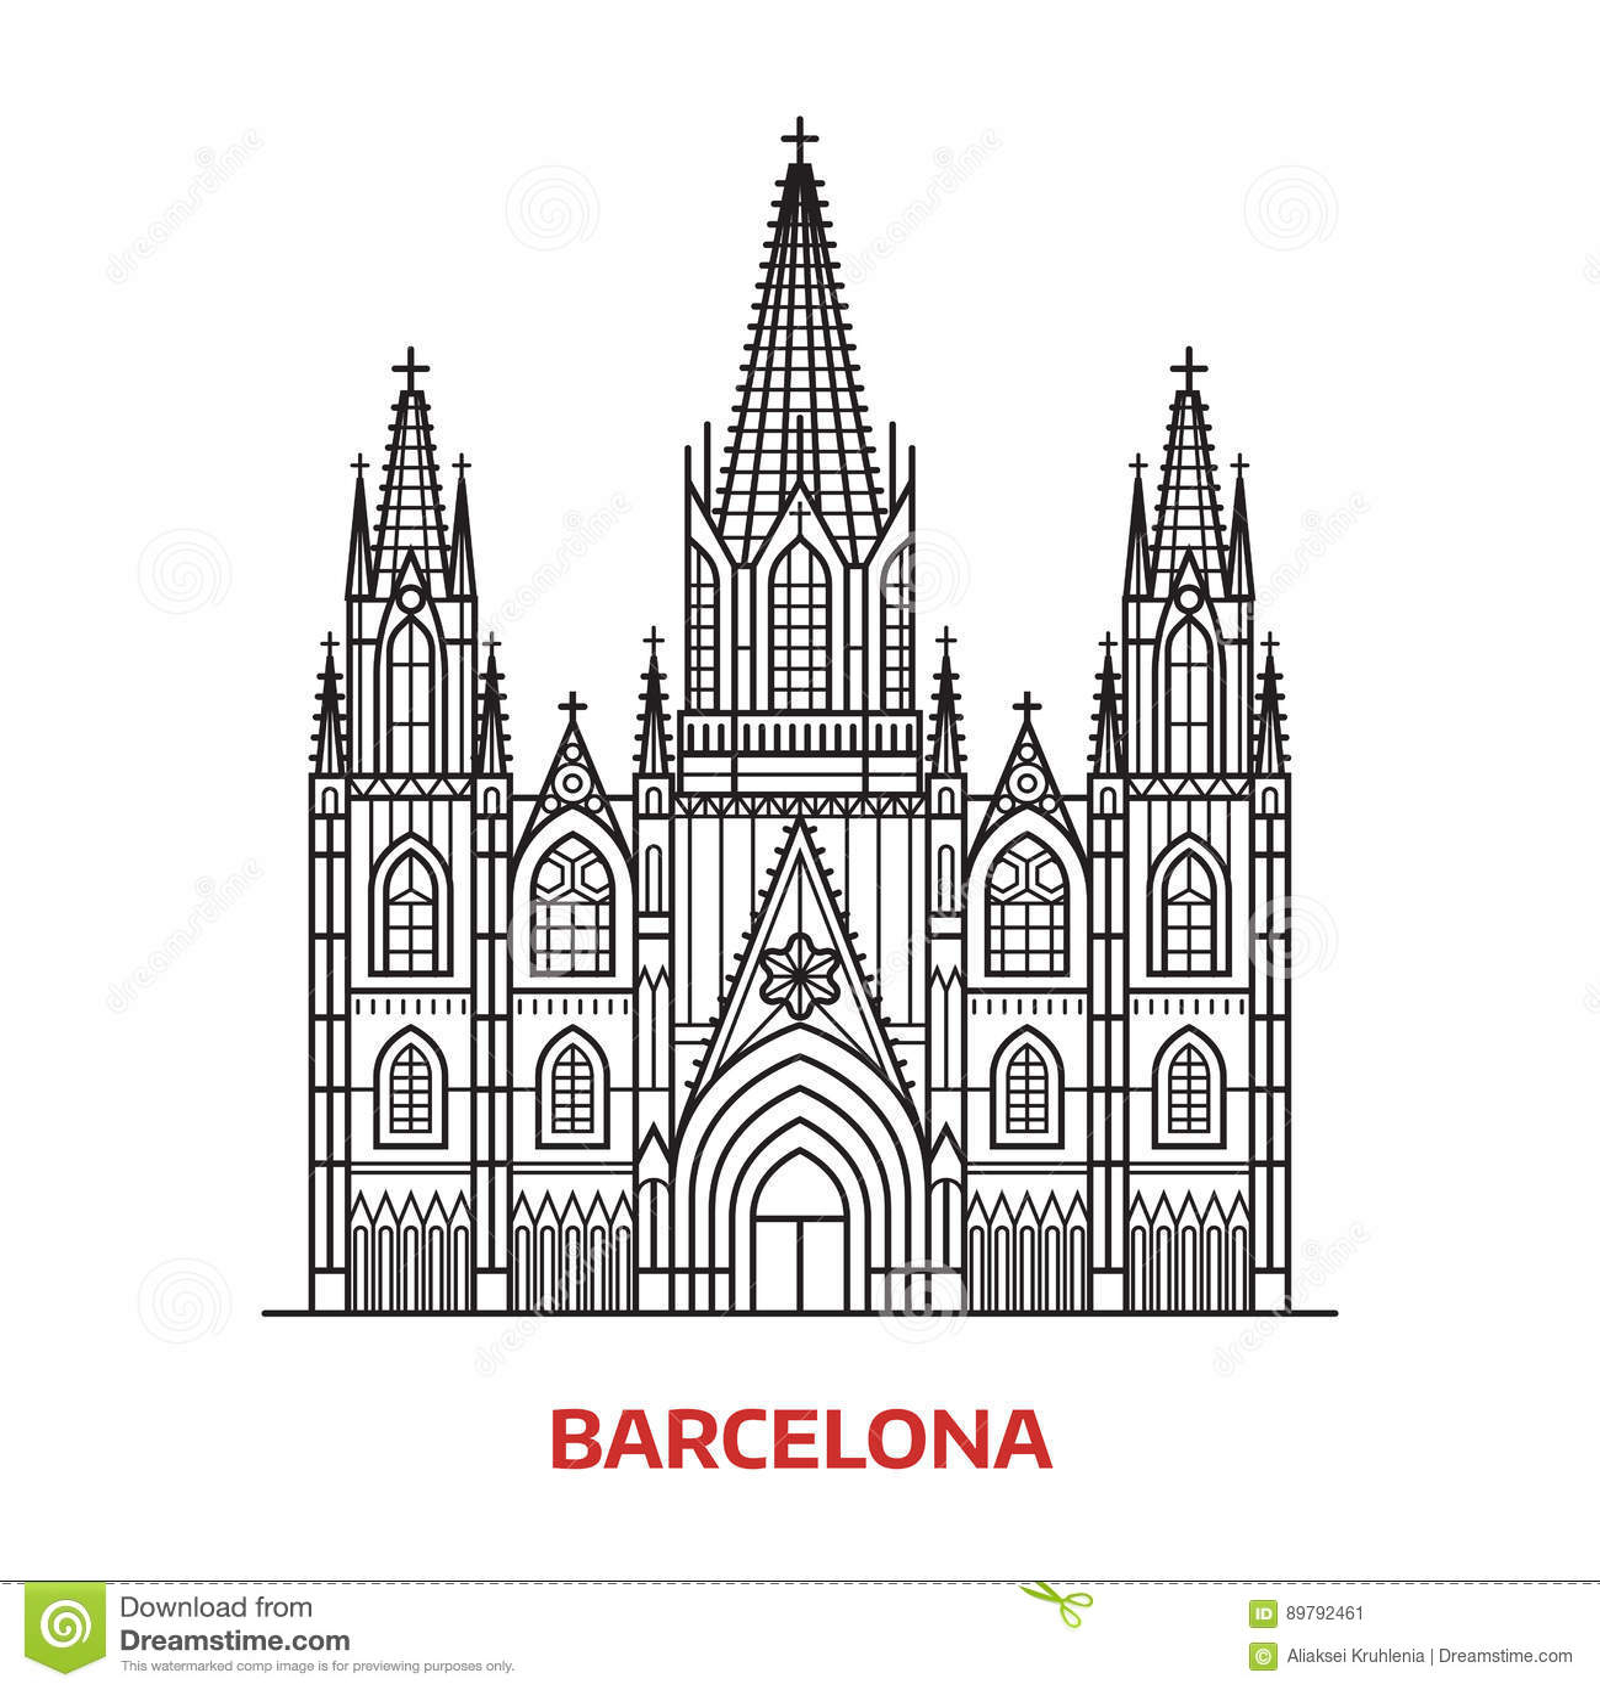 Illustration Spanish Tourist Attractions In Spain Vector